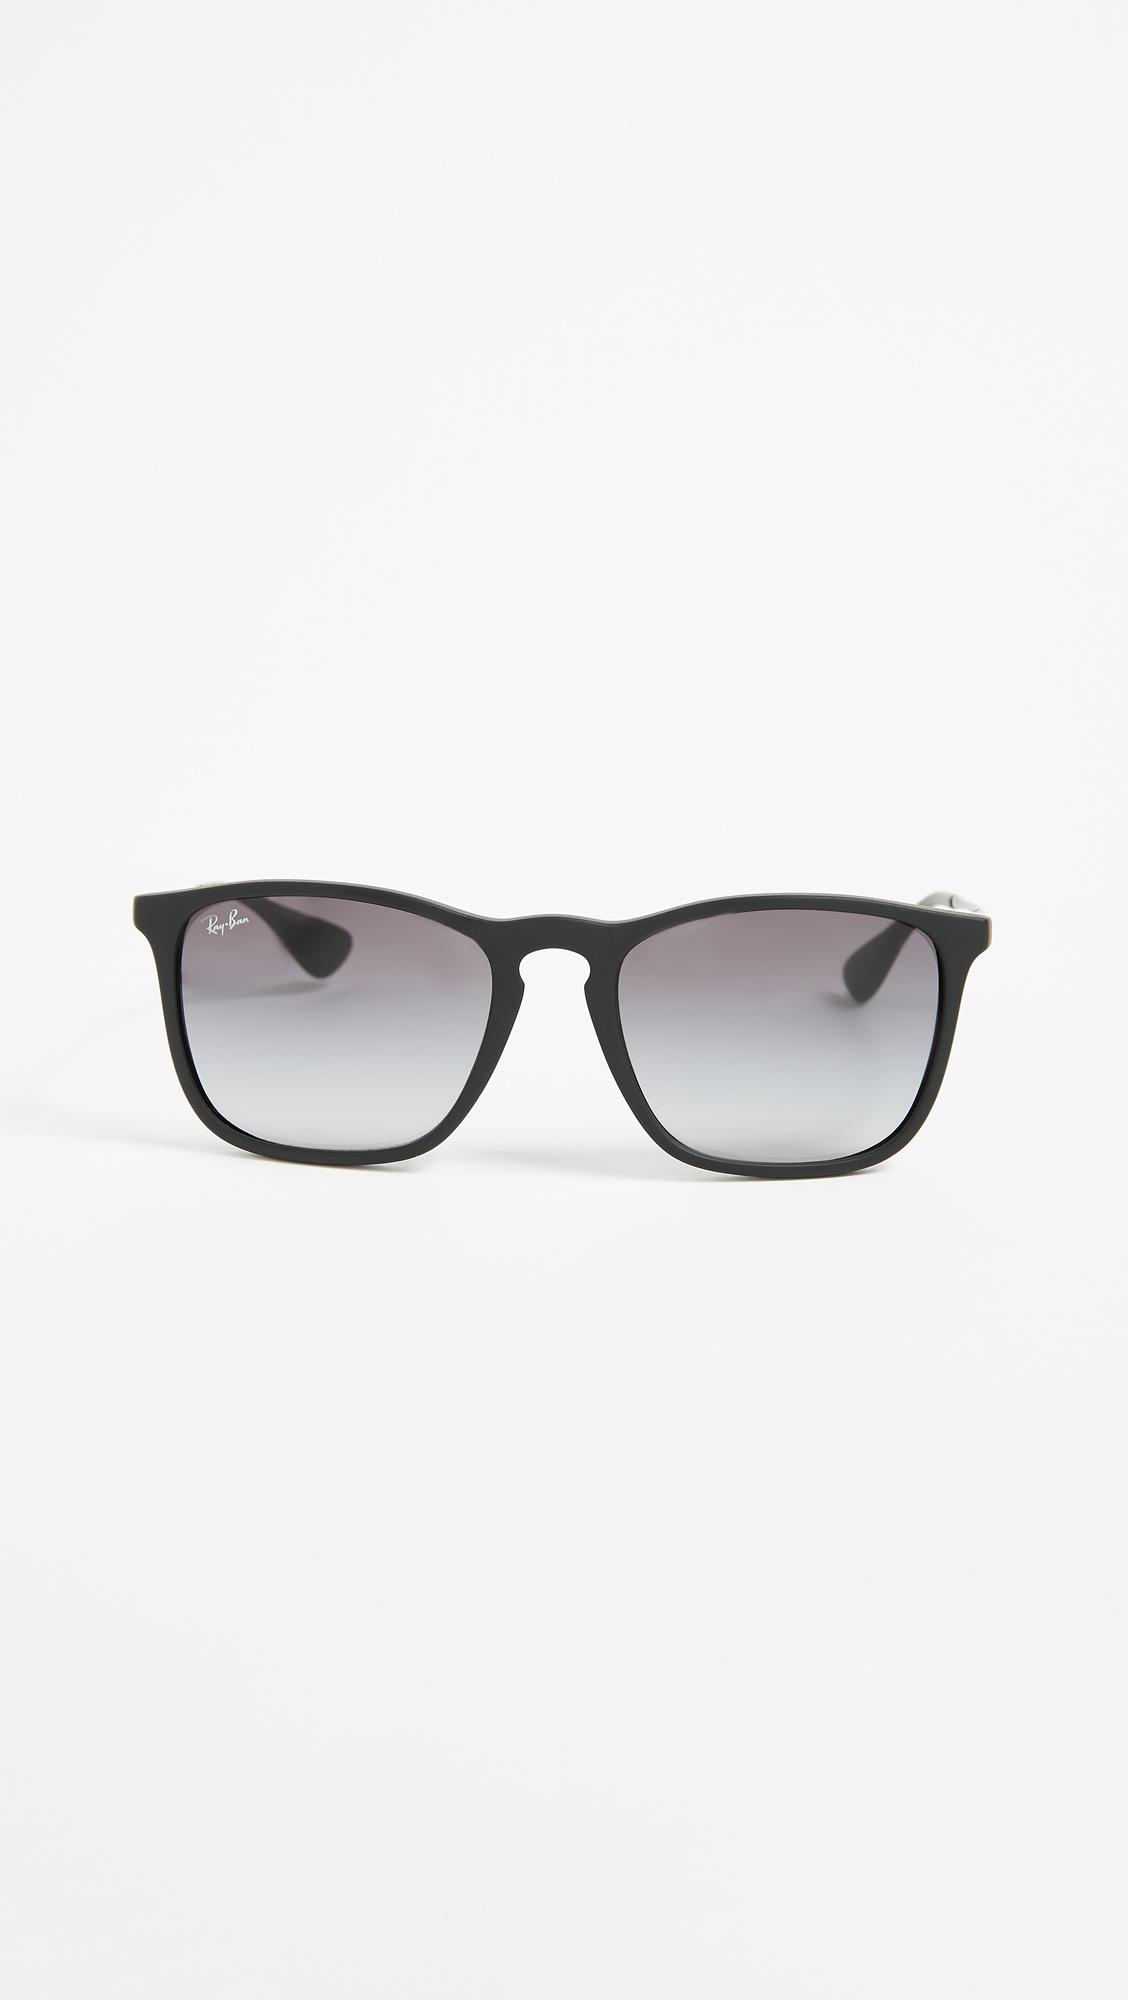 2ad55b3425 Ray-Ban RB4187 Chris Square Sunglasses